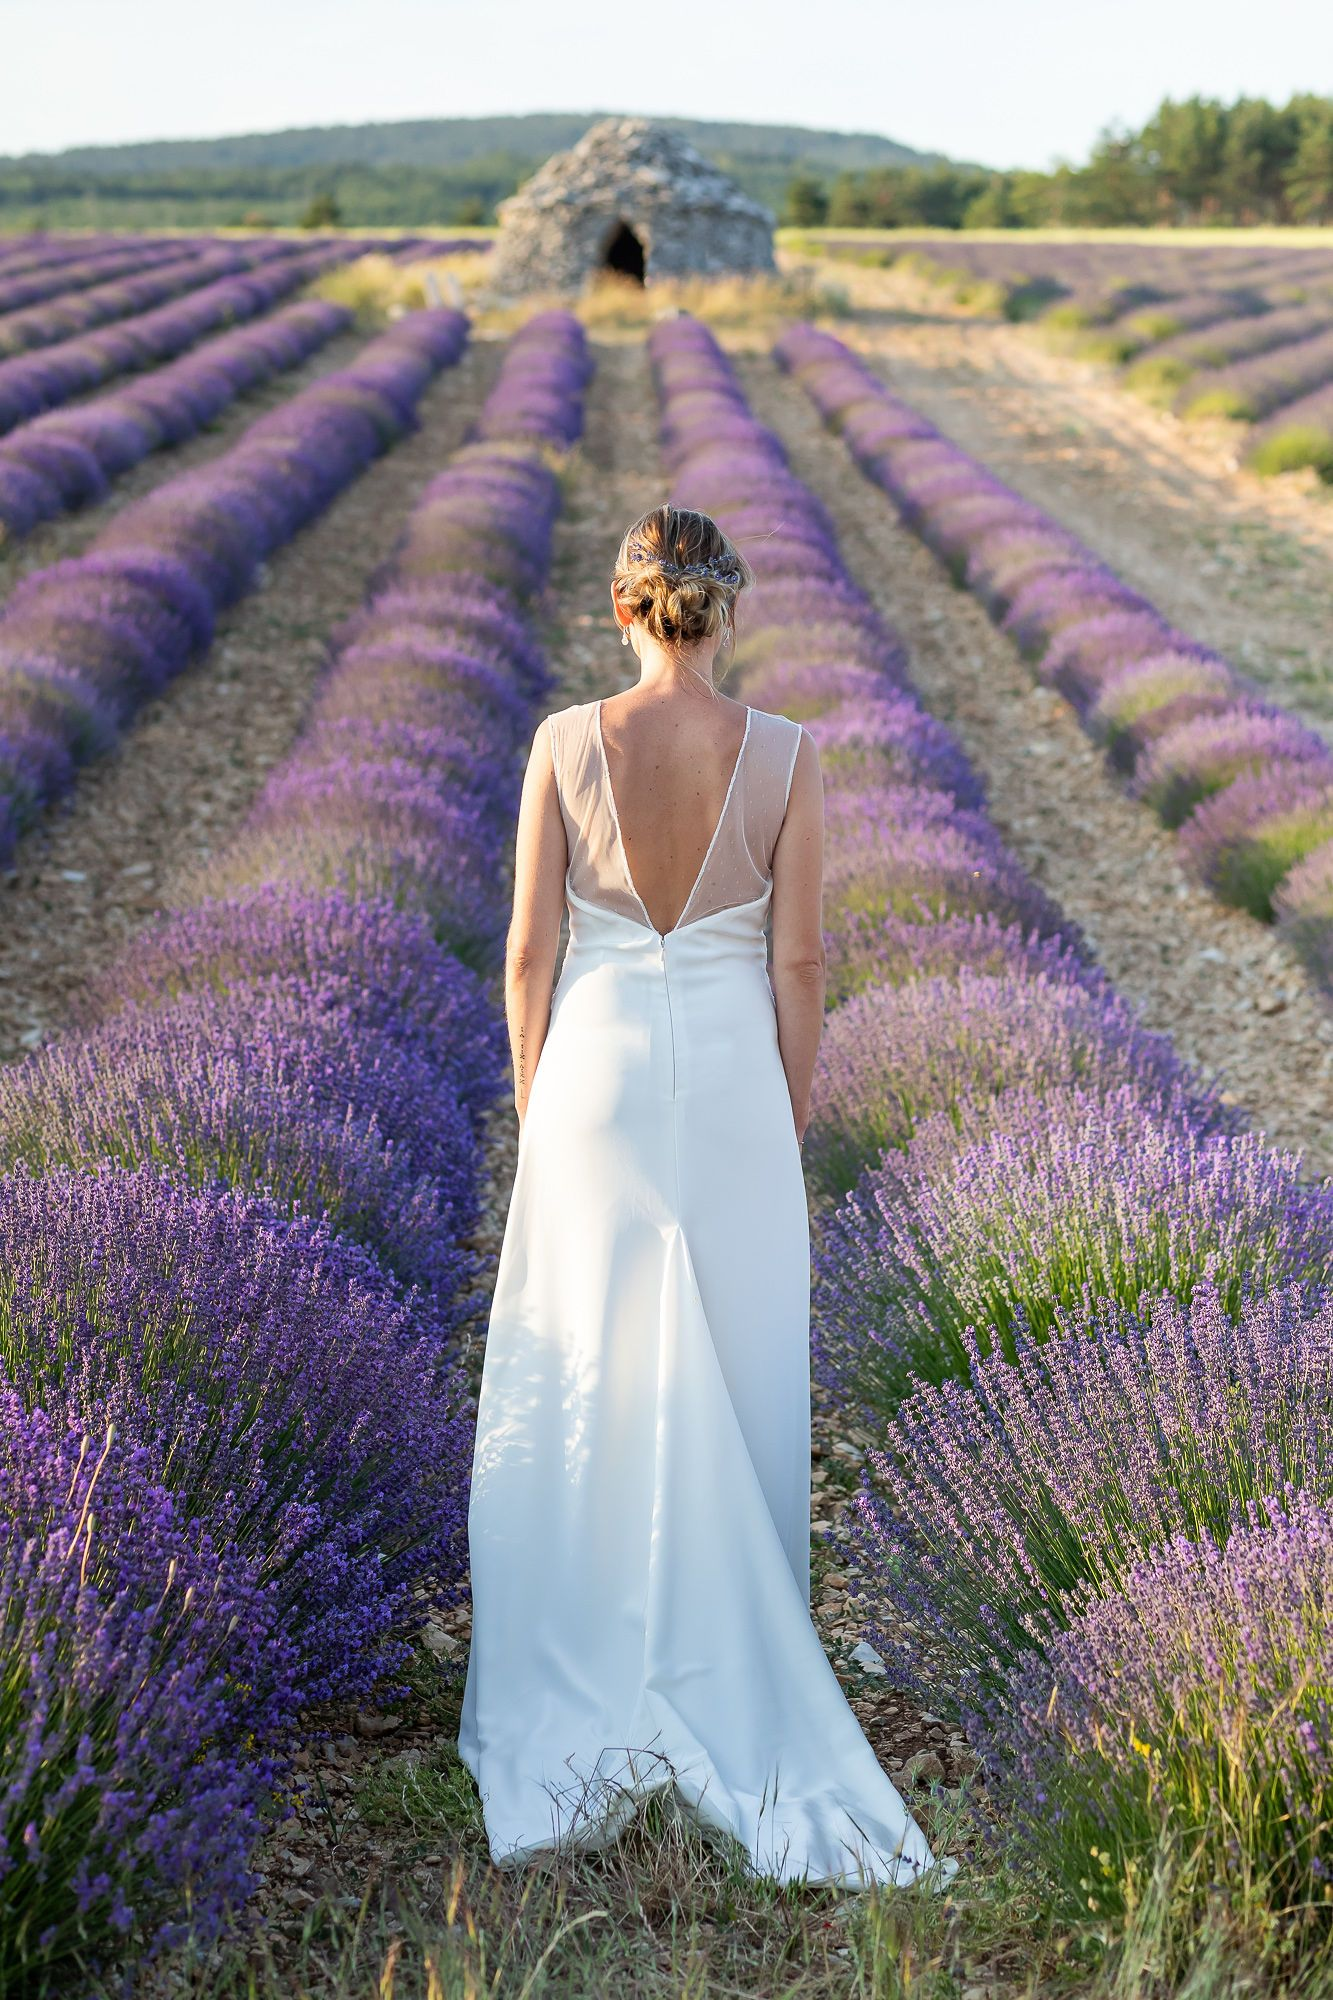 Mariage Intime En Provence Elopement En 2020 Mariage Intime Mariage Robes De Mariee A Manches